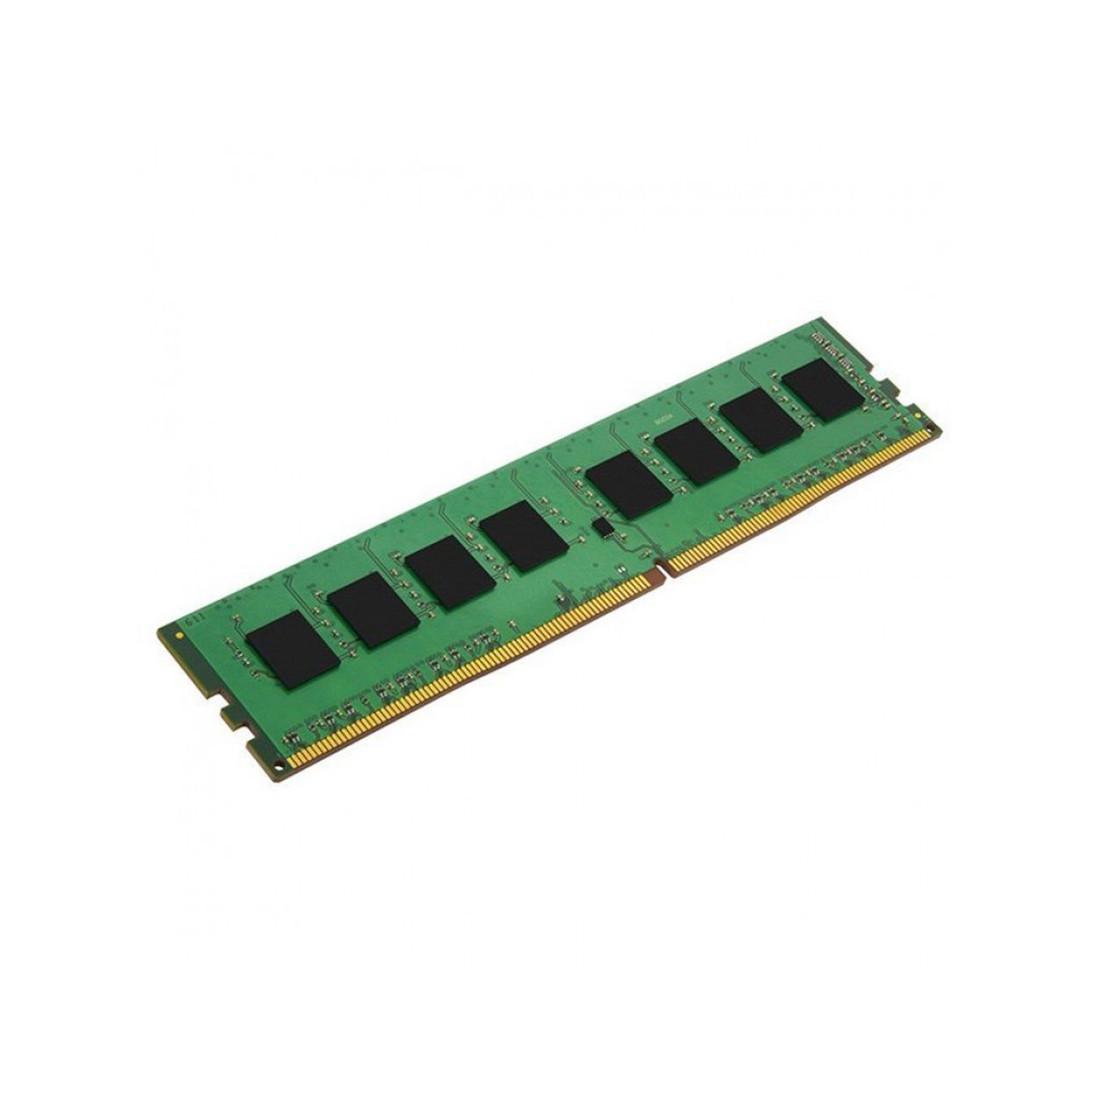 Модуль памяти Kingston KVR24N17S8/8 DDR4 8 GB DIMM  CL17 8 chip